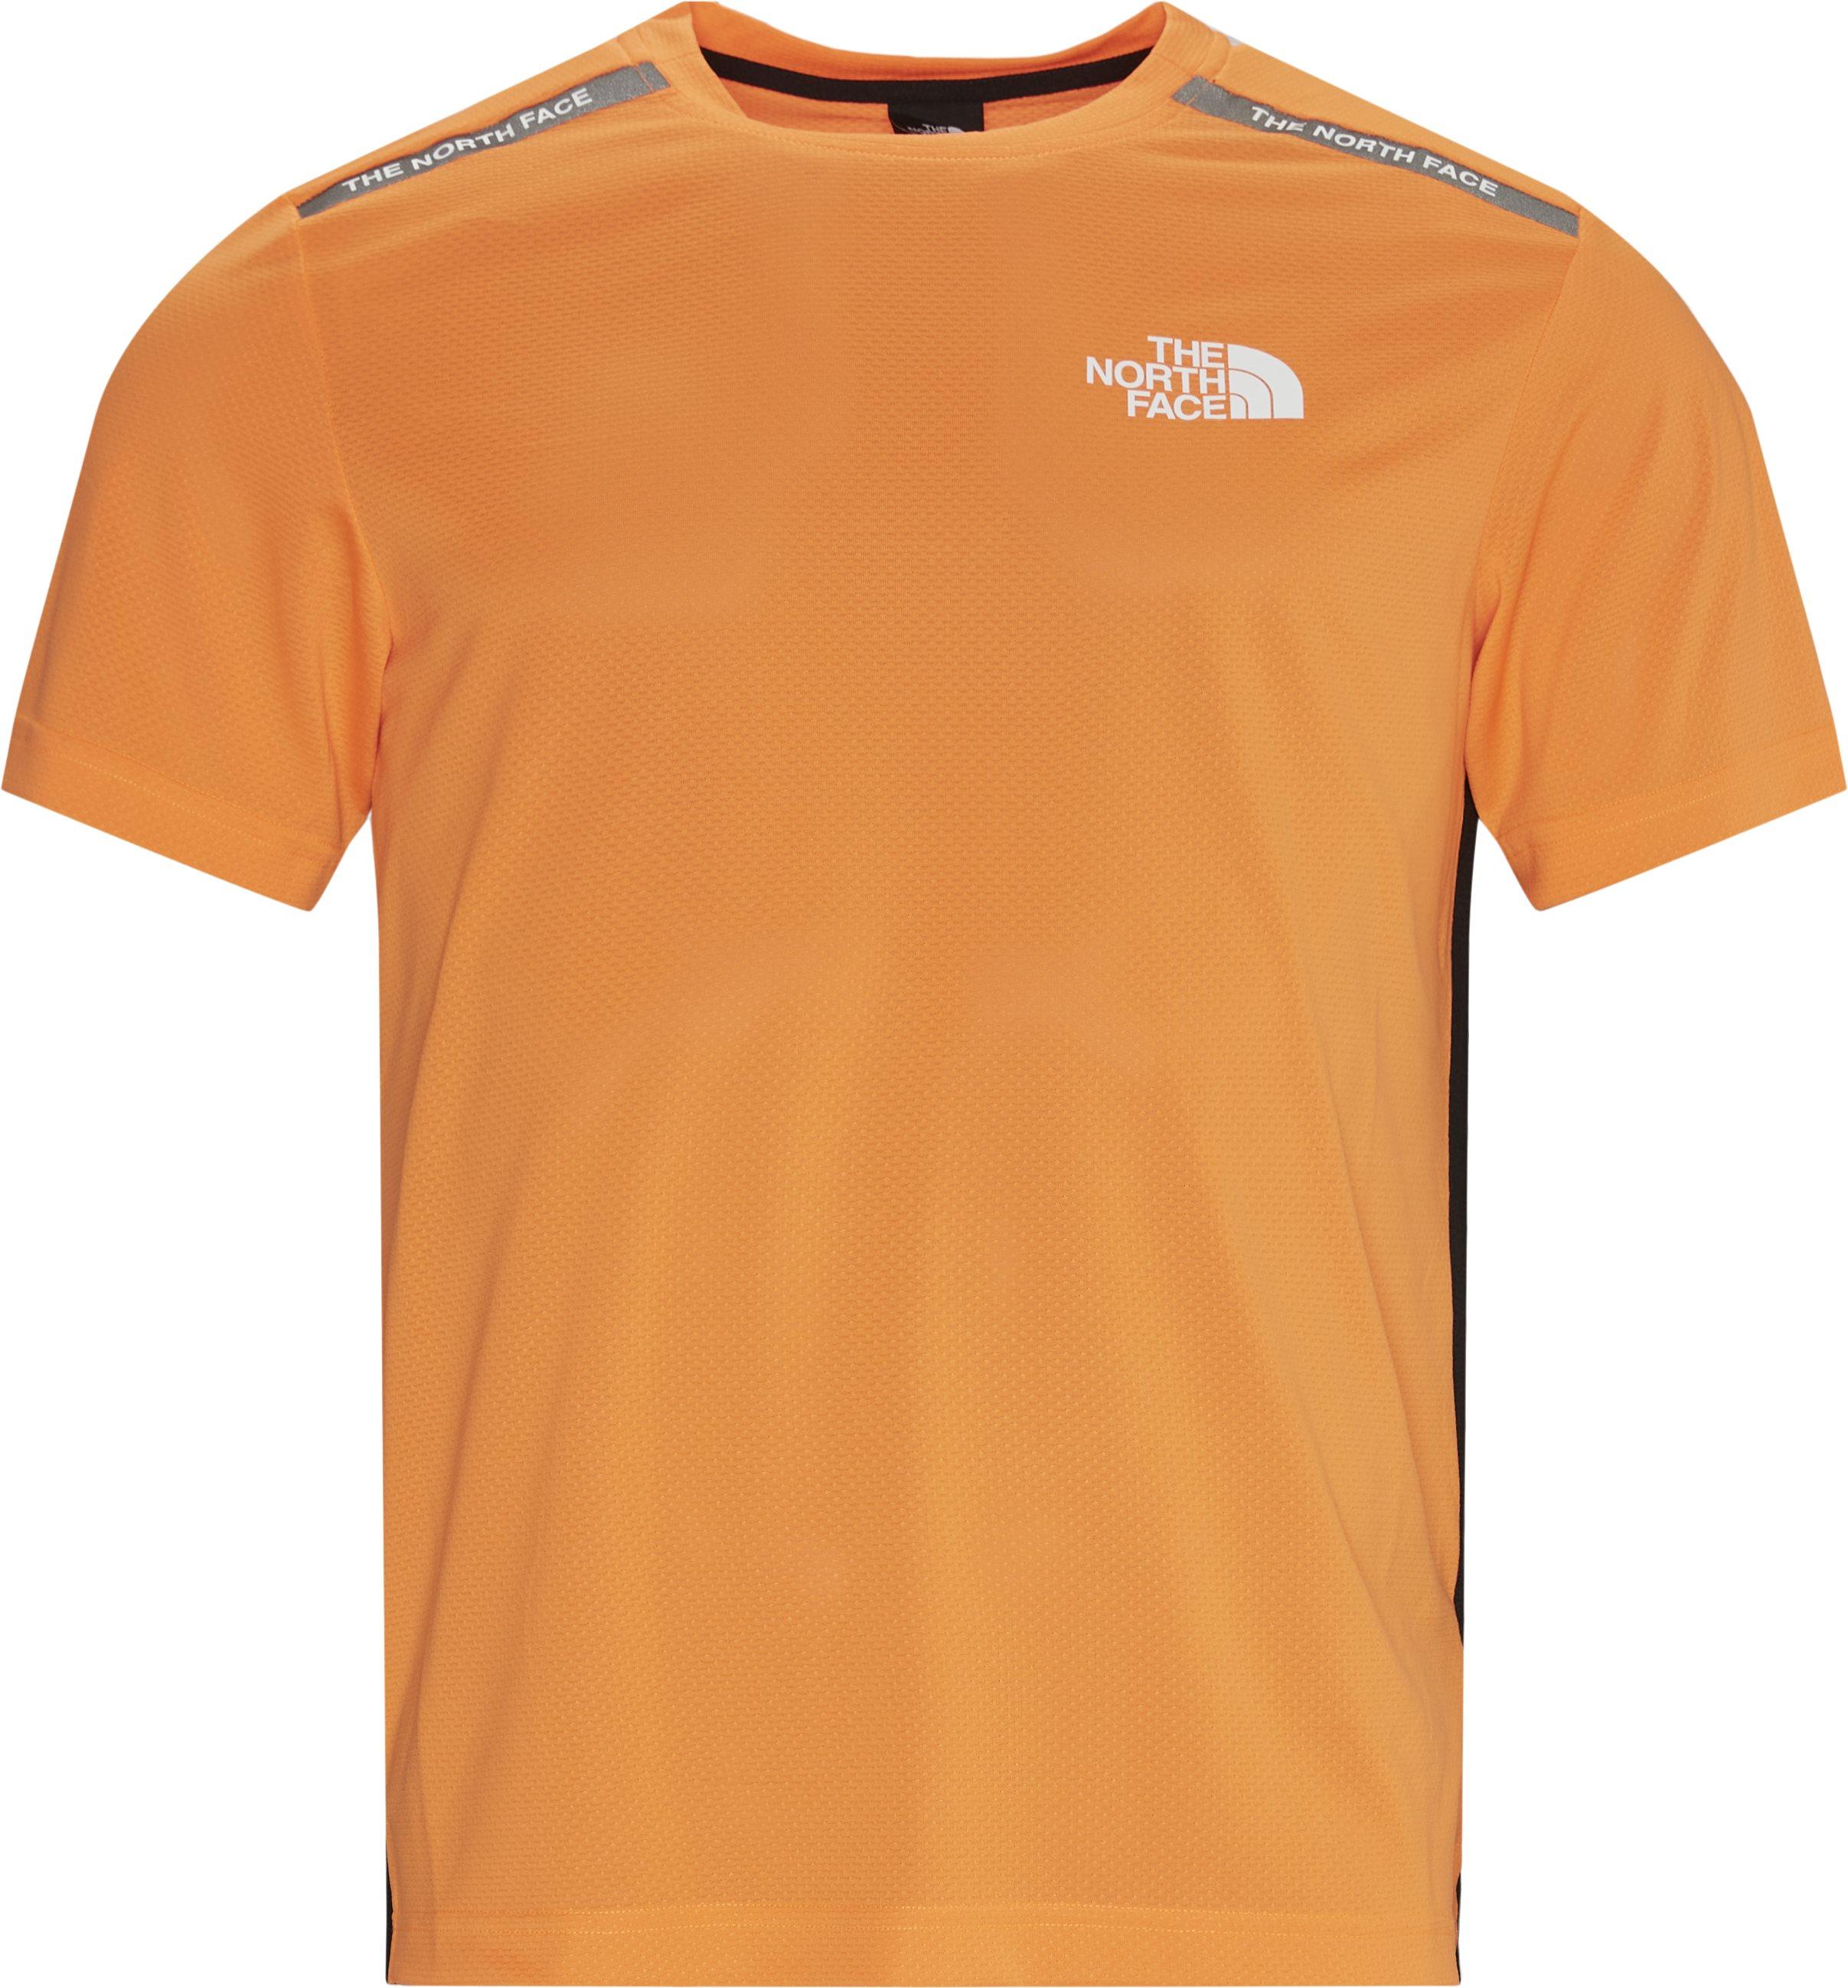 Eu Tee - T-shirts - Regular fit - Orange